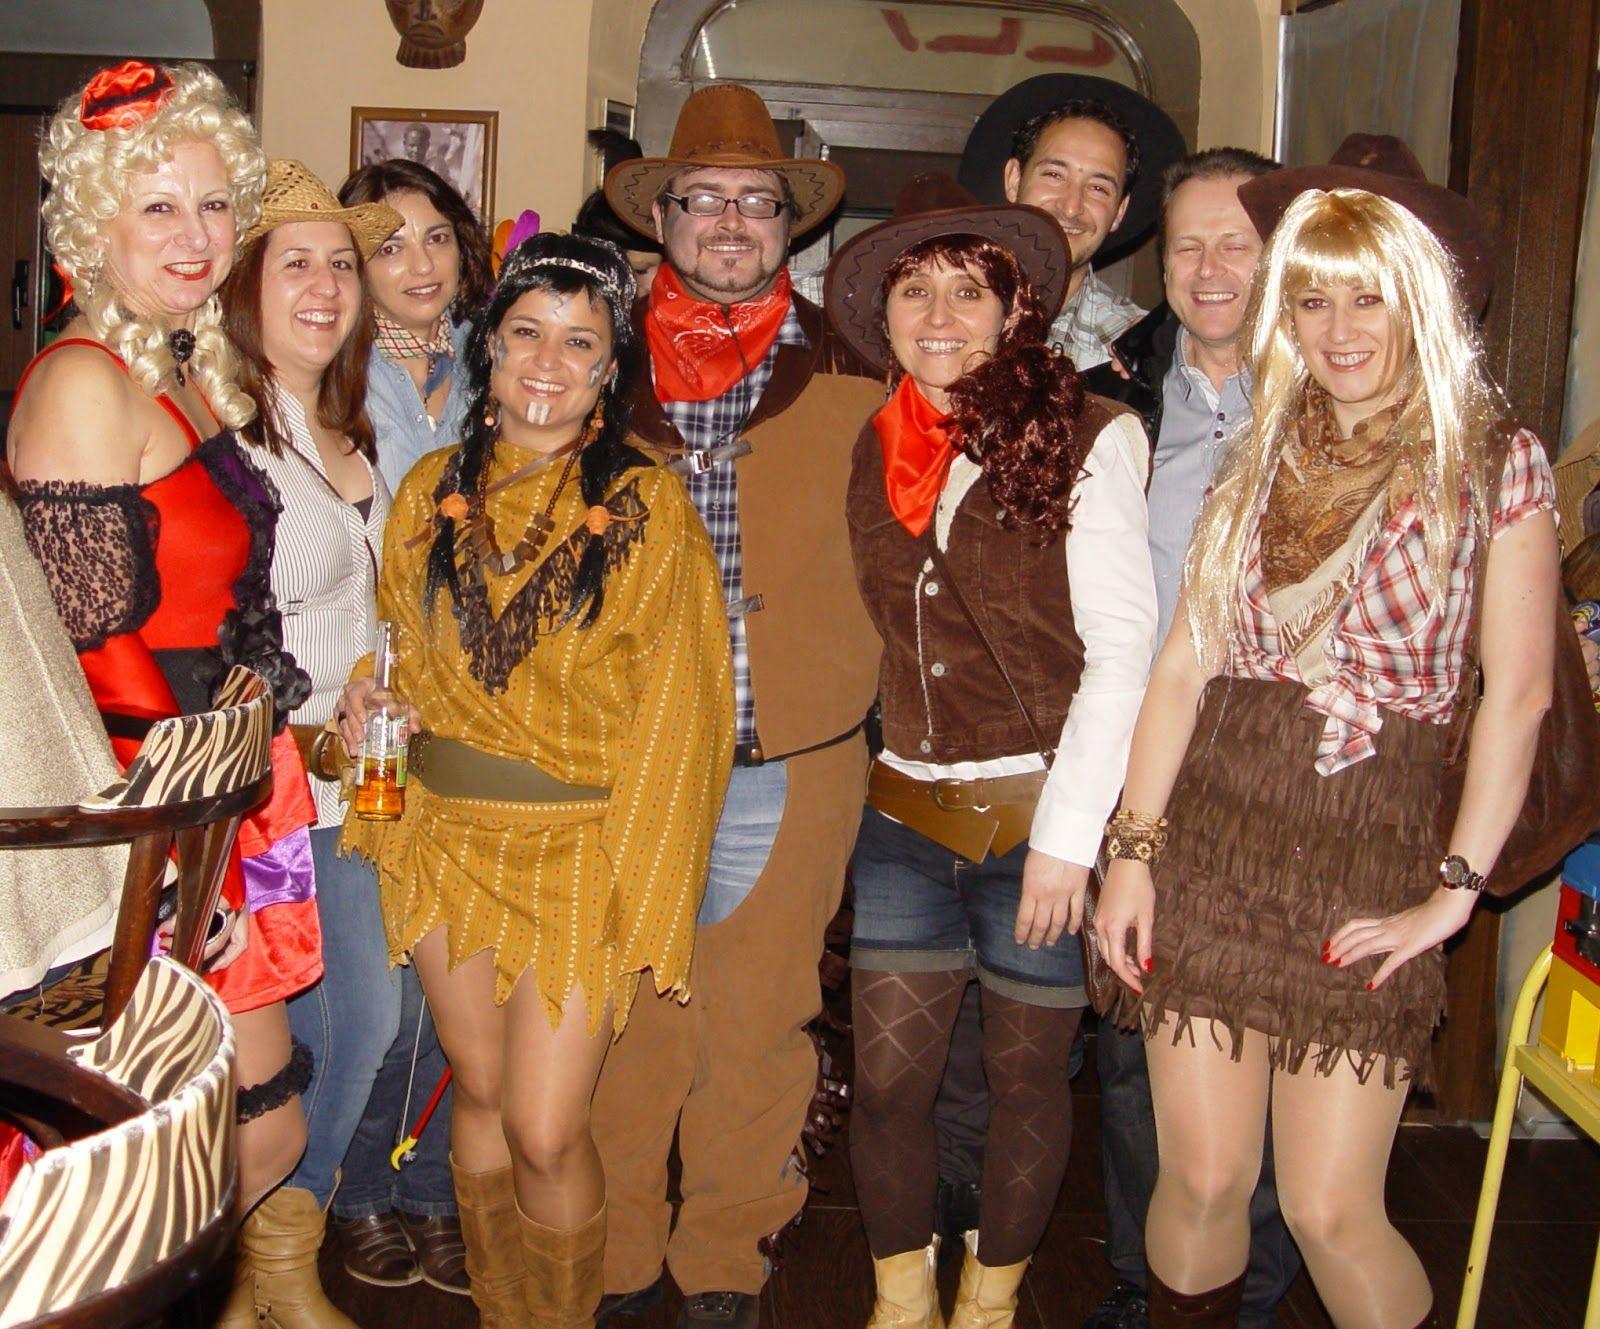 disfraz carnaval costume halloween party wildwest cowboy - Wild Halloween Party